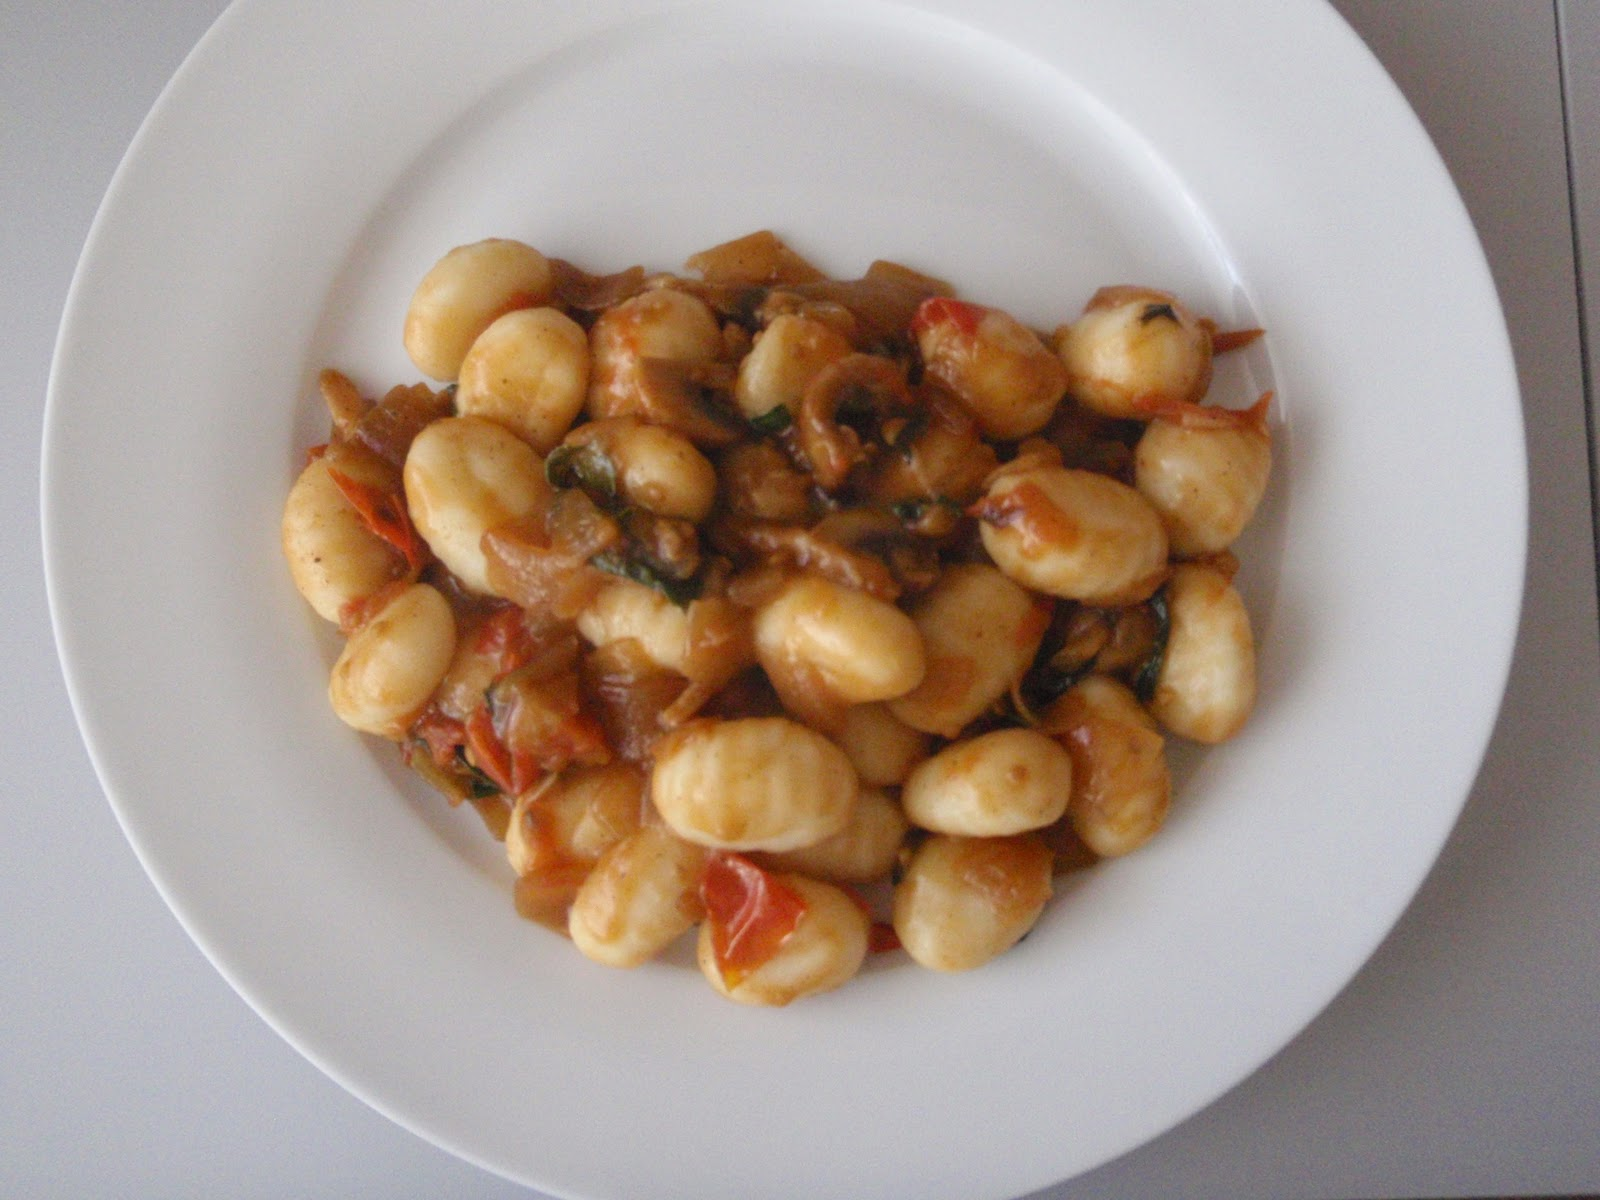 Mushroom and basil sauce